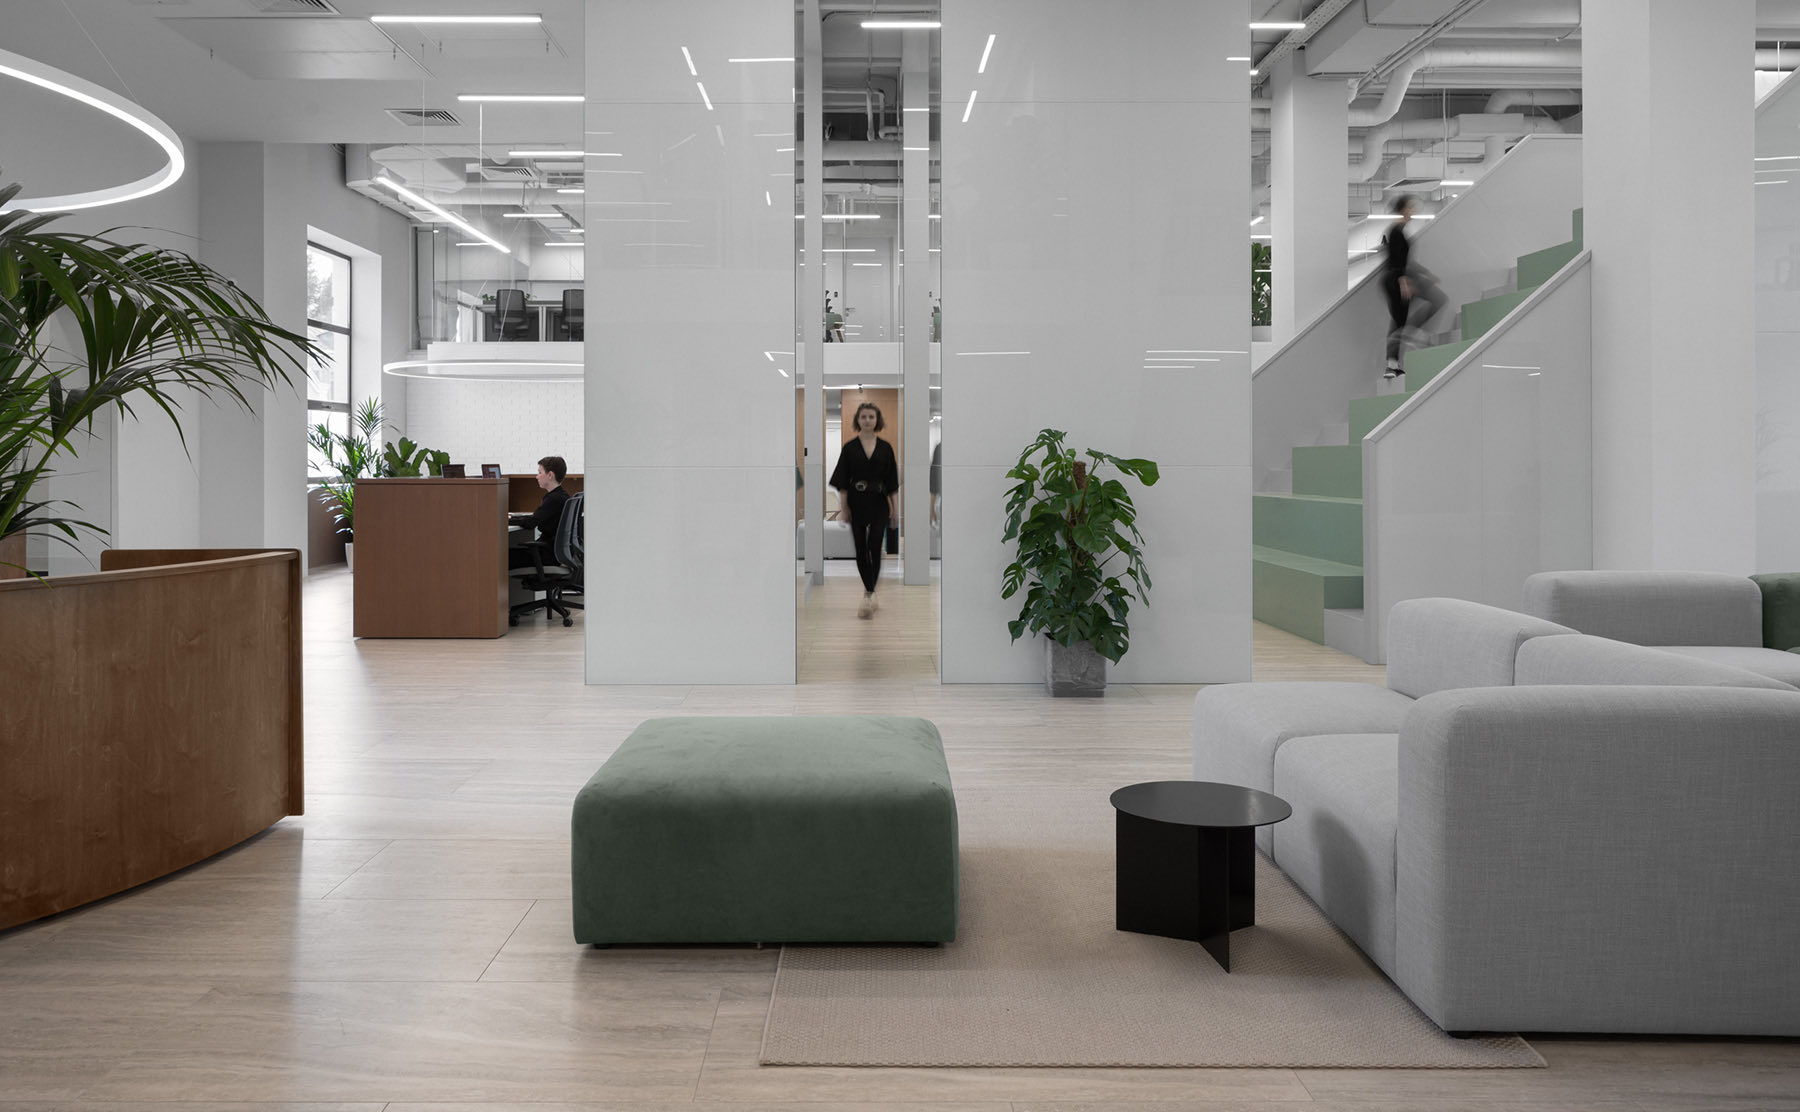 praktik-coworking-space-minsk-7